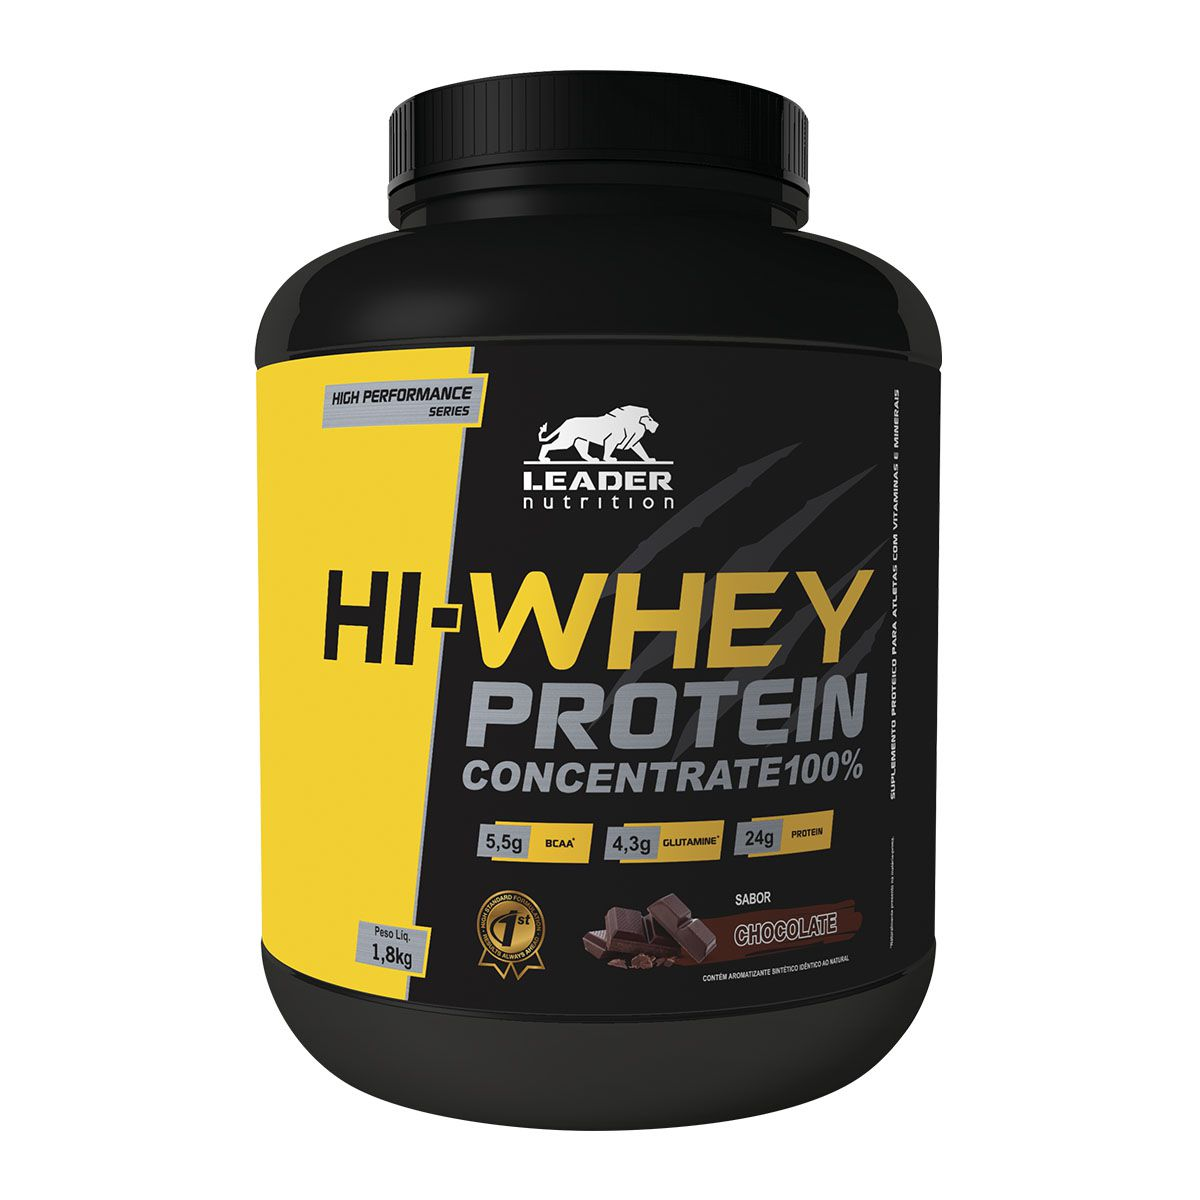 Hi-Whey Protein 1,8Kg - Leader Nutrition